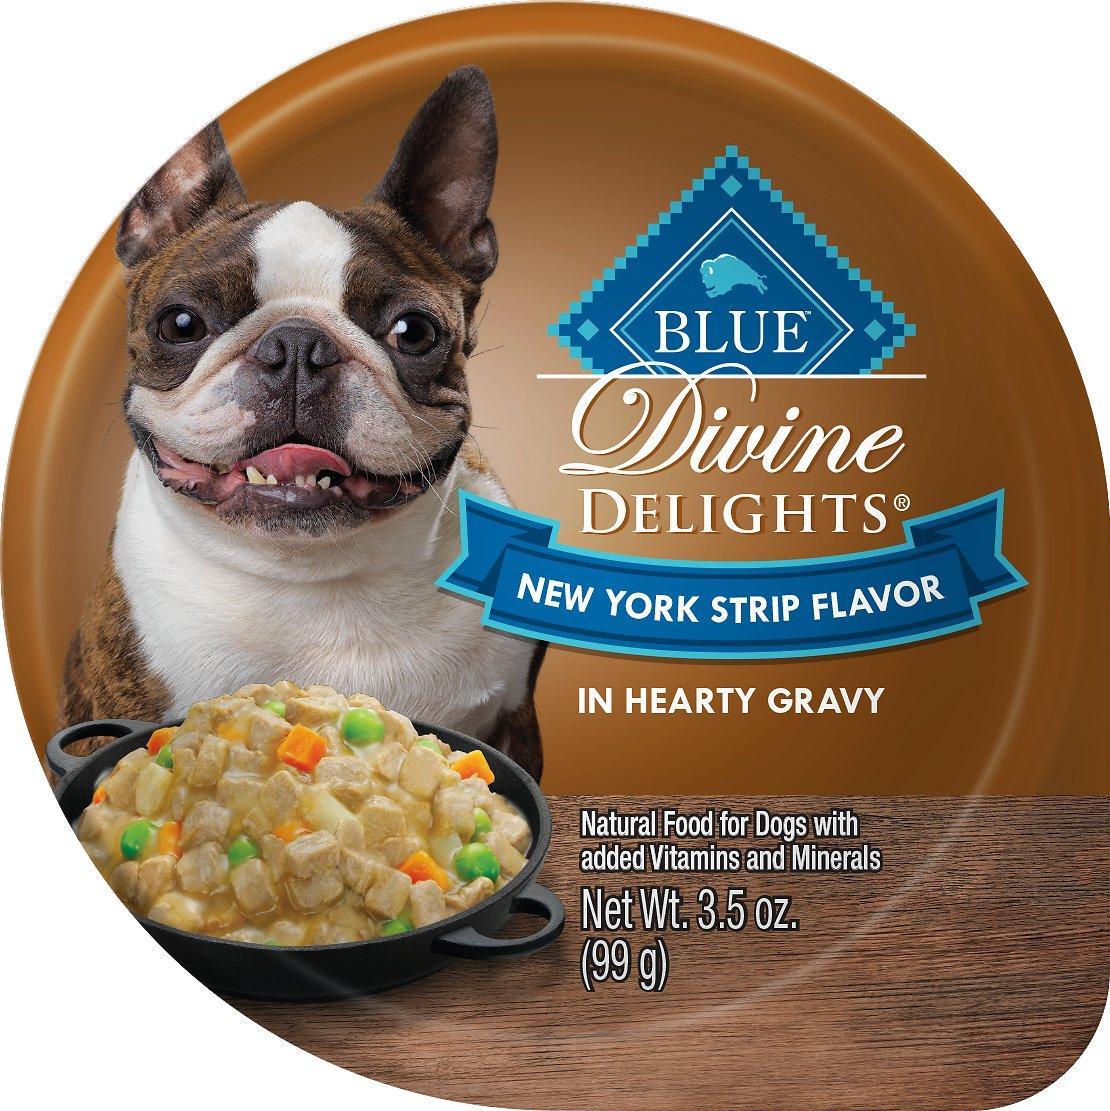 Blue Buffalo Divine Delights New York Strip Flavor Hearty Gravy Dog Food Trays Image